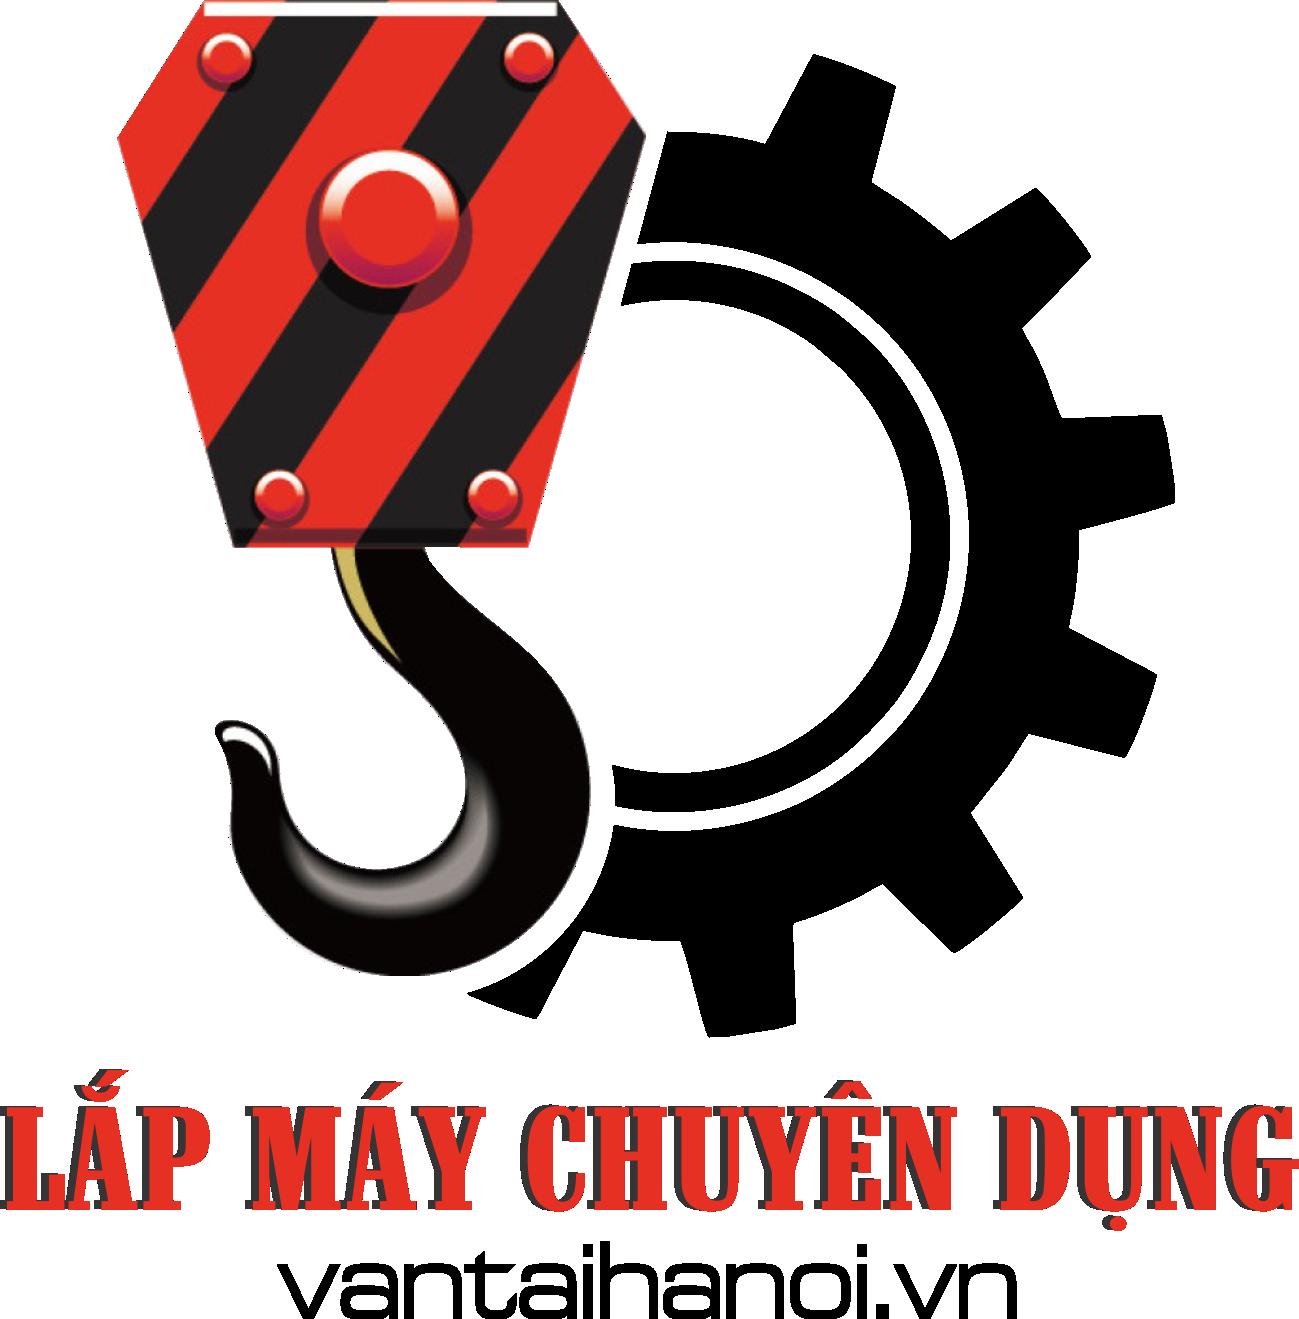 llogo-lap-may-chuyen-dung